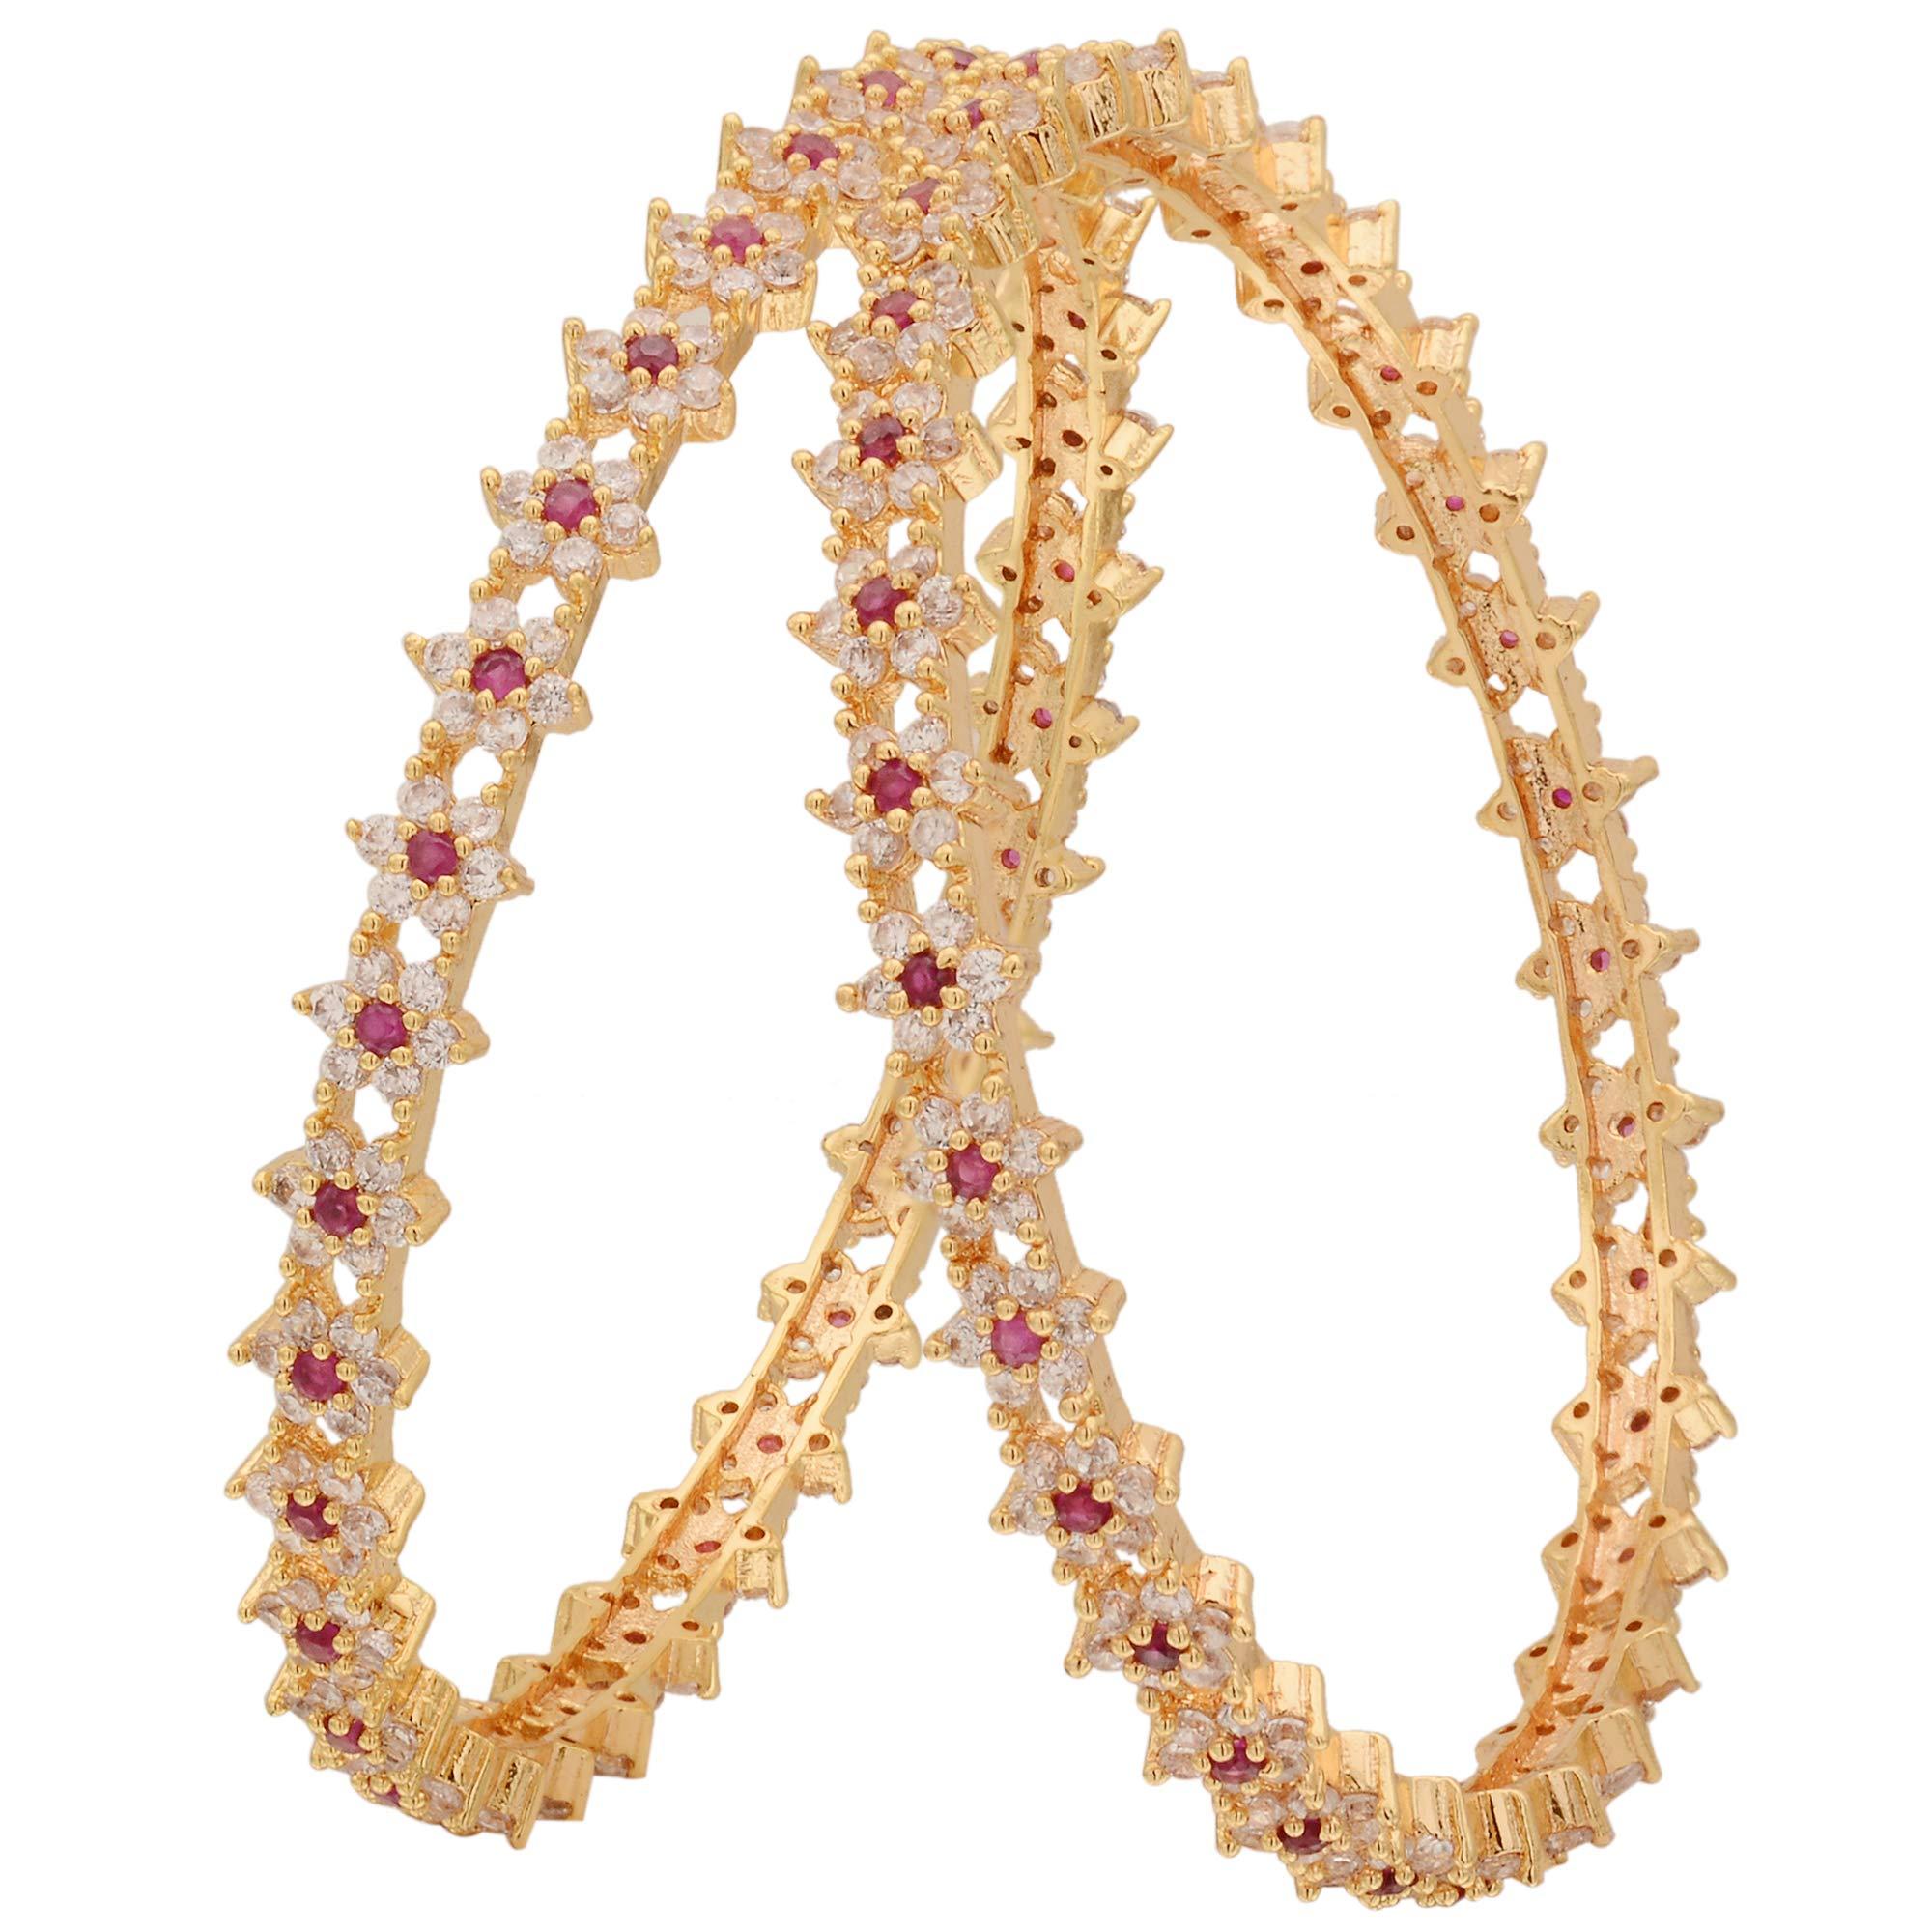 Sasitrends CZ/AD Micro Gold Plated American Diamond Star Design Bangles for Women (White Ruby, 2.6) (B07K2NY9VR) Amazon Price History, Amazon Price Tracker